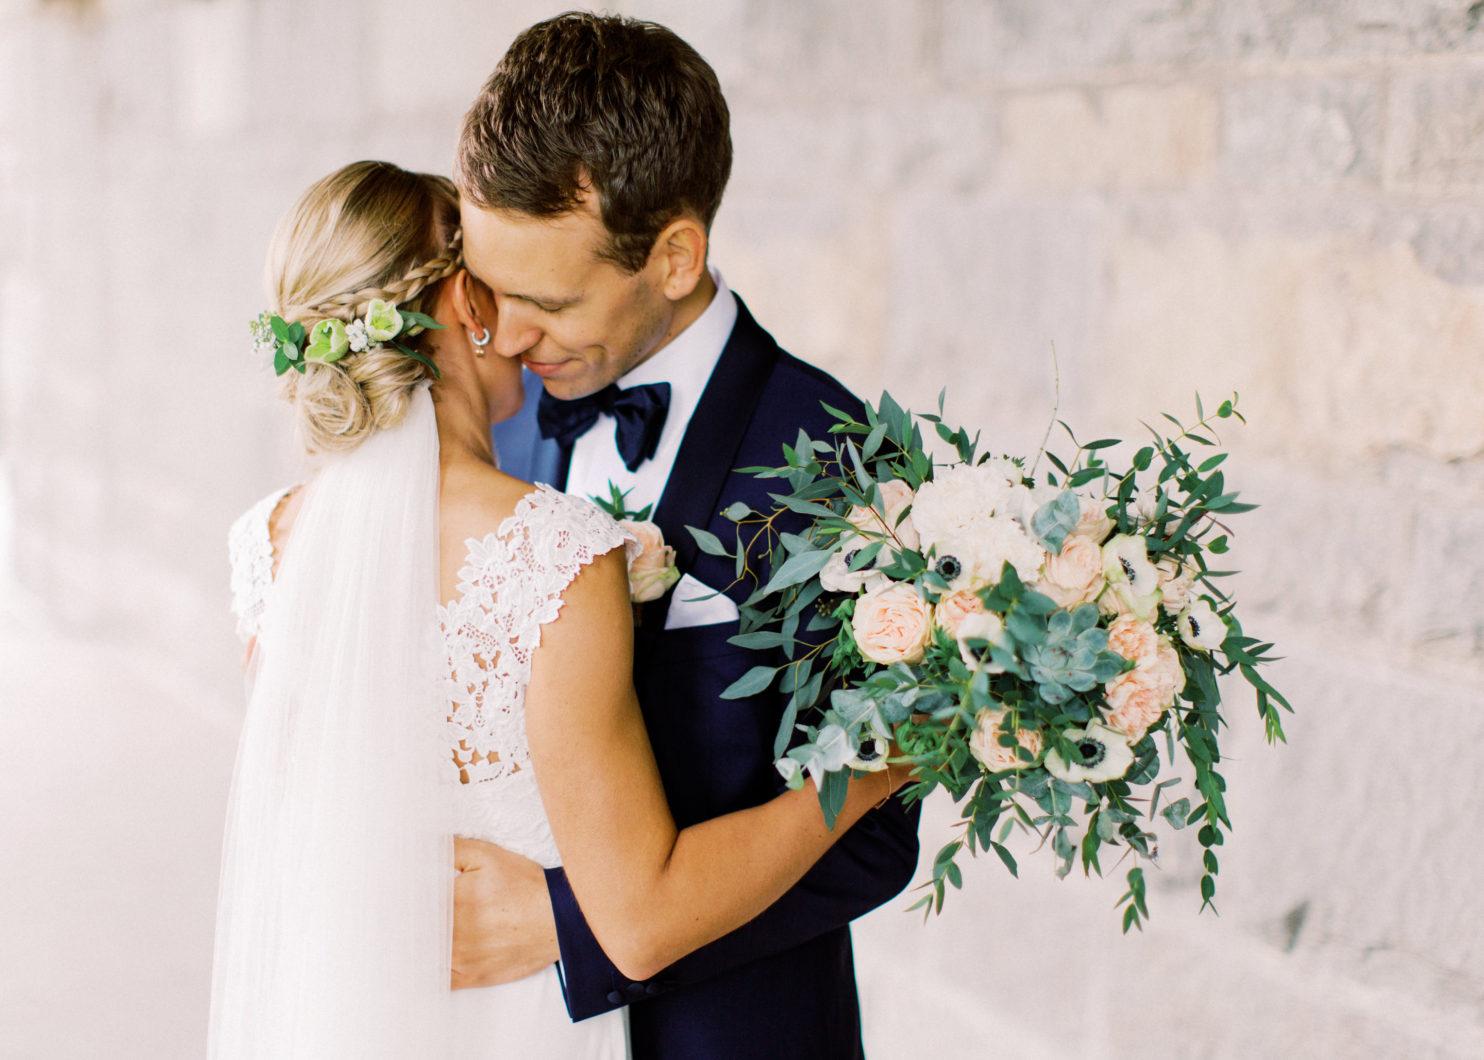 Fotograf-Eline-Jacobine-Wedding-Bjertorp-slott-1-5